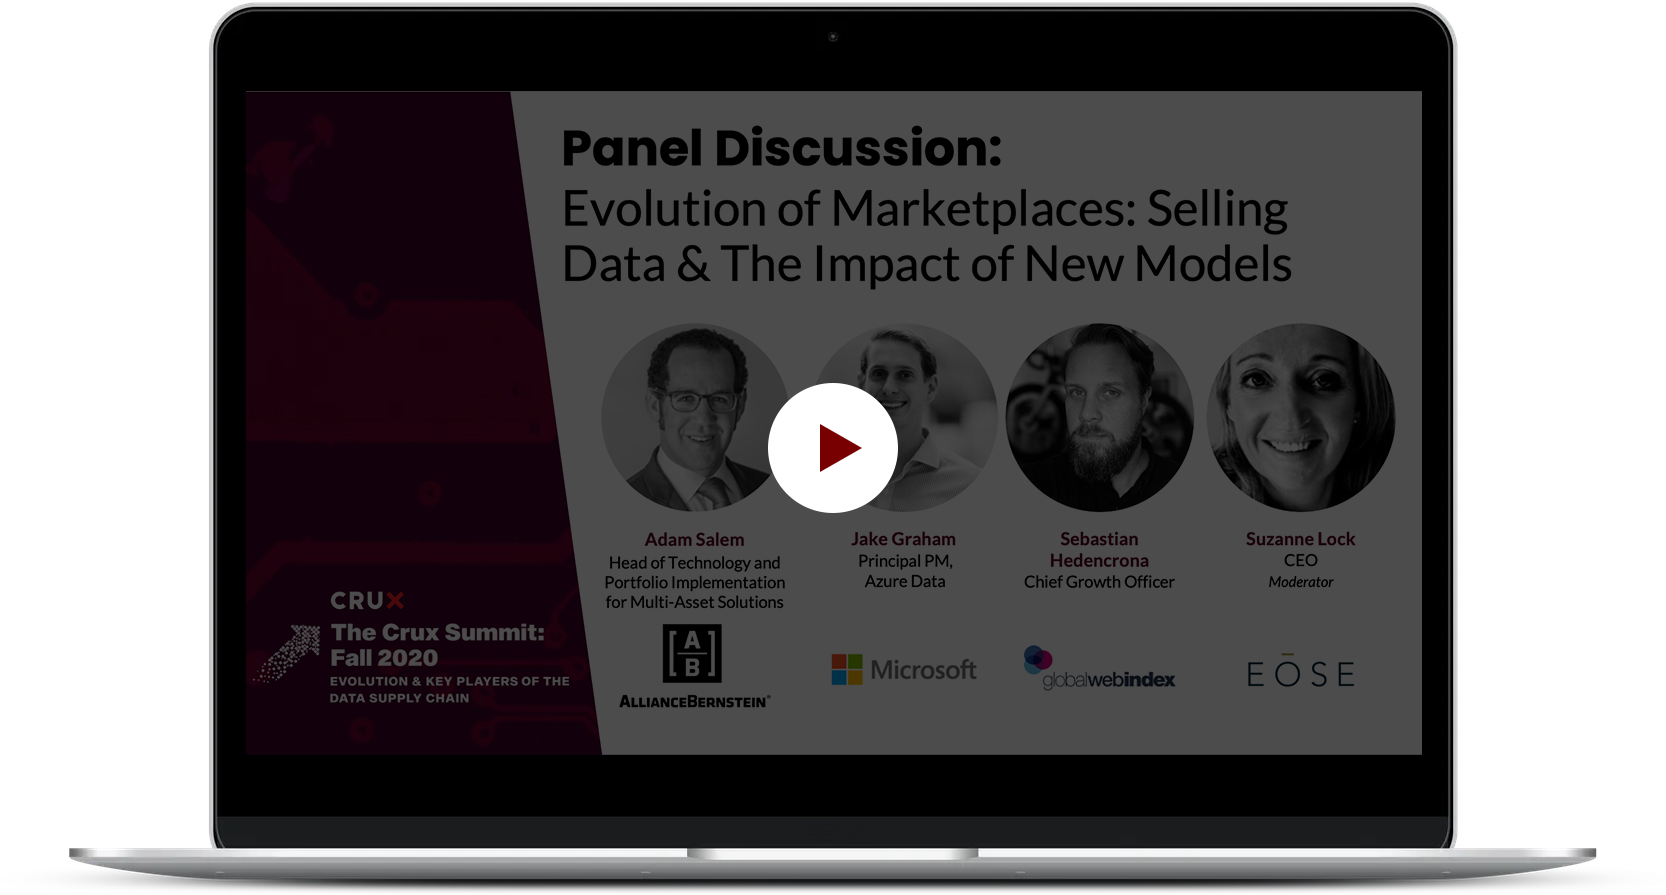 Crux_TCS_PanelDiscussion+EvolutionMarketplace+SellingDataImpactofNewModels_04